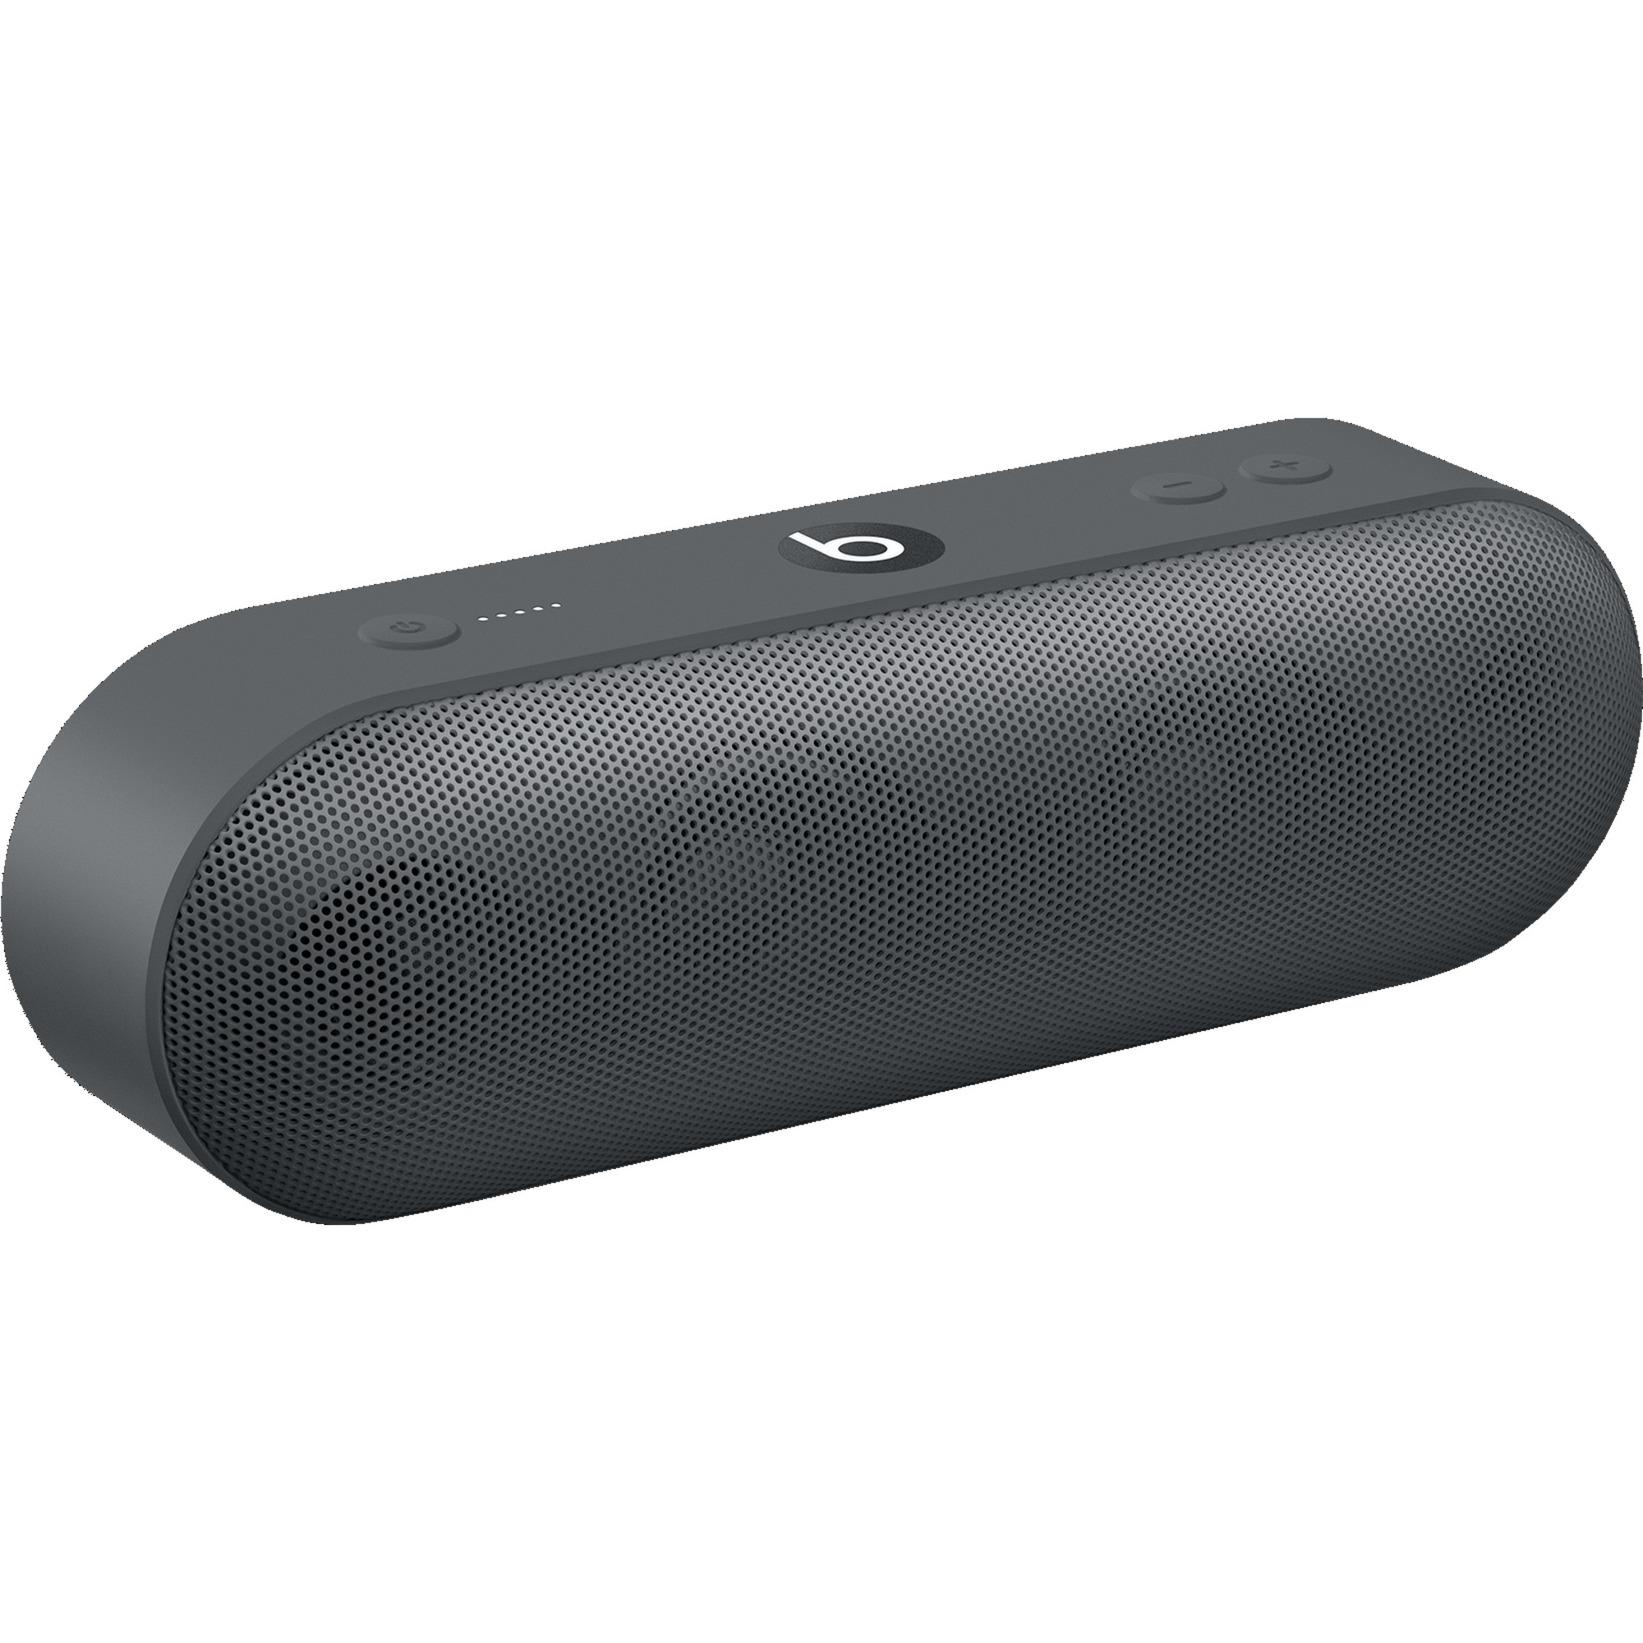 Beats Pill+ Altavoz portátil estéreo 12.5W Gris